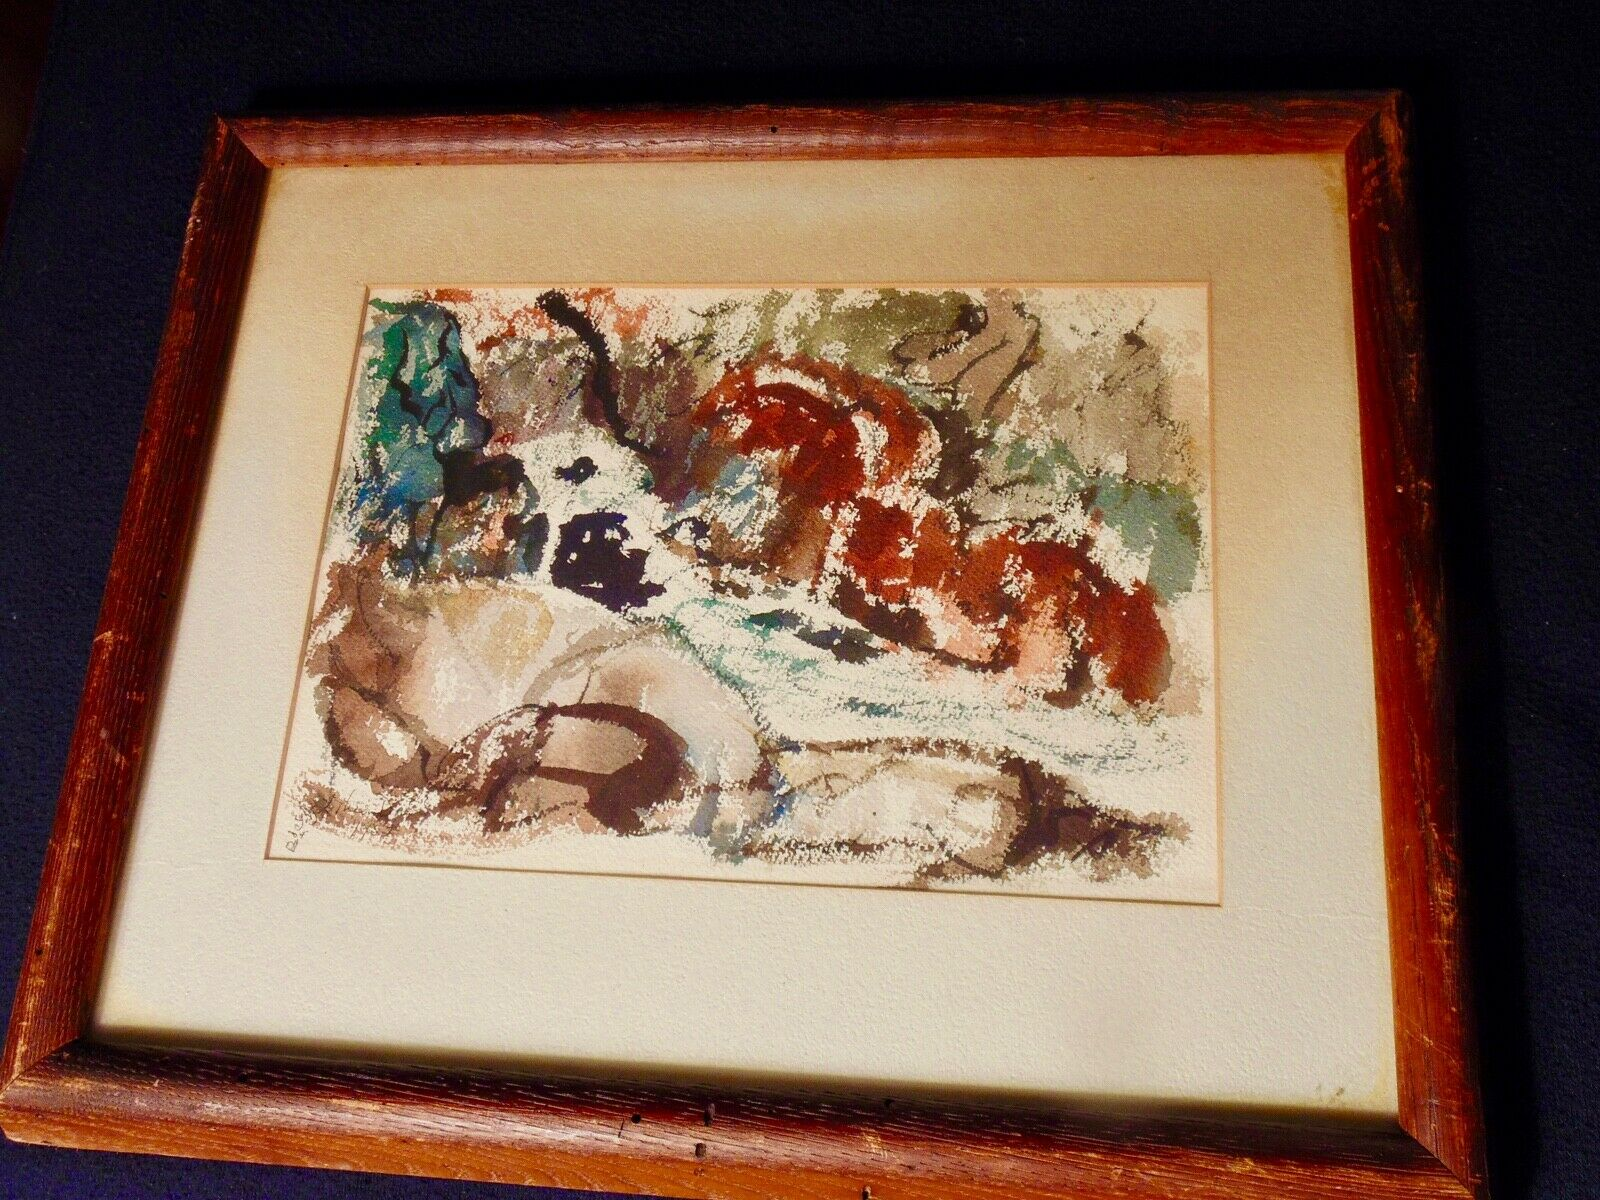 L. THEODORE DAVIS ALSO TED DAVIS ORIGINAL WATERCOLOR Sgn c.1940s LISTED-NR - $95.00